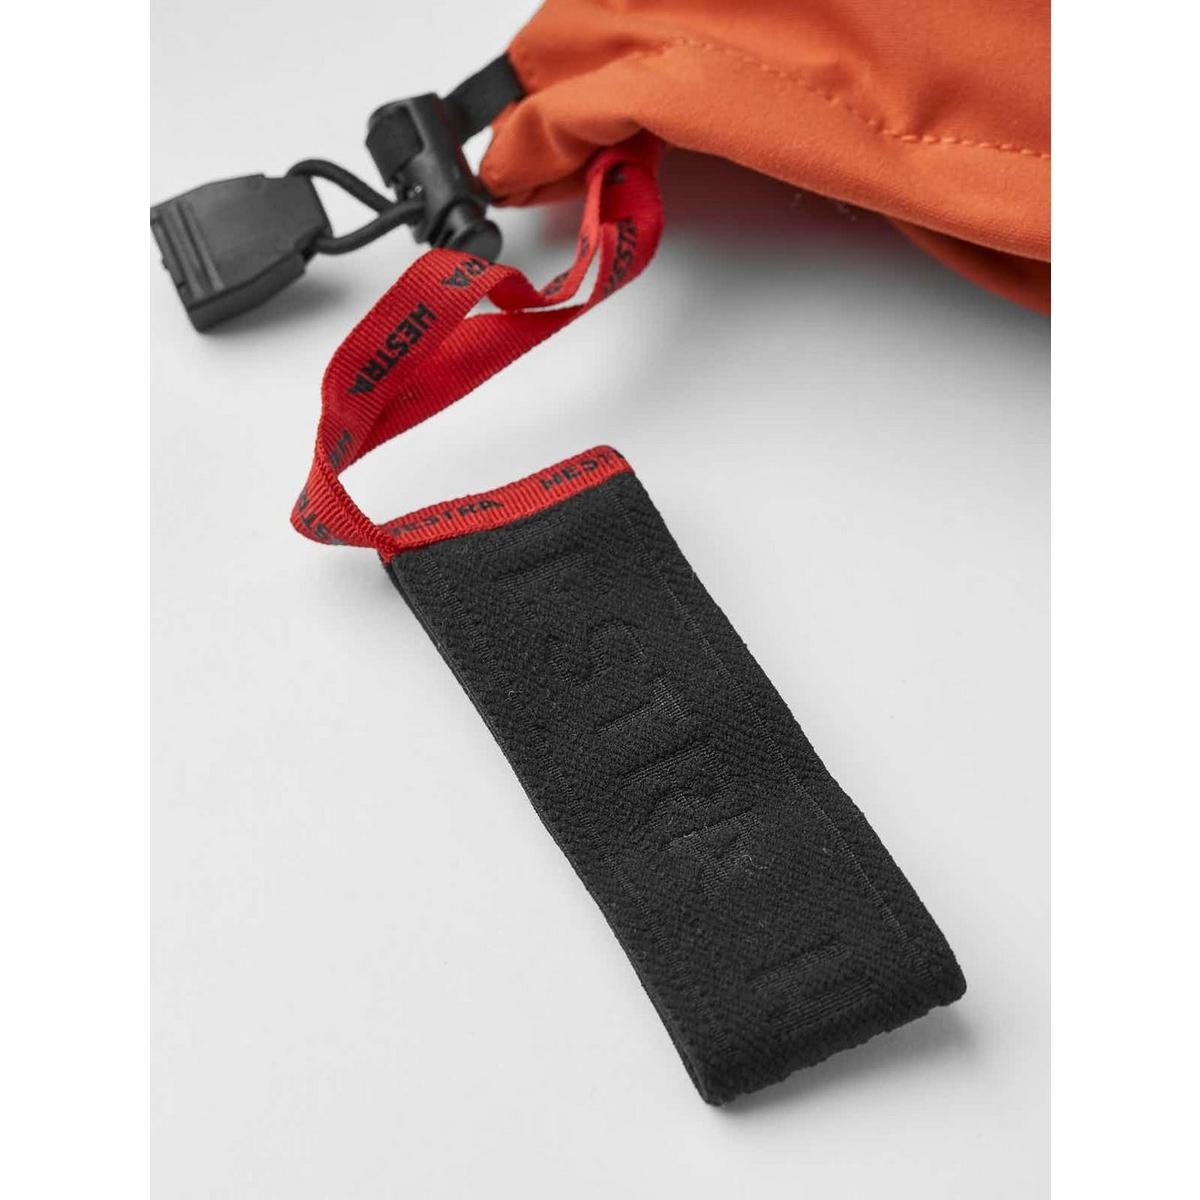 Hestra Men's Army Leather Heli Ski Glove - Brick Red